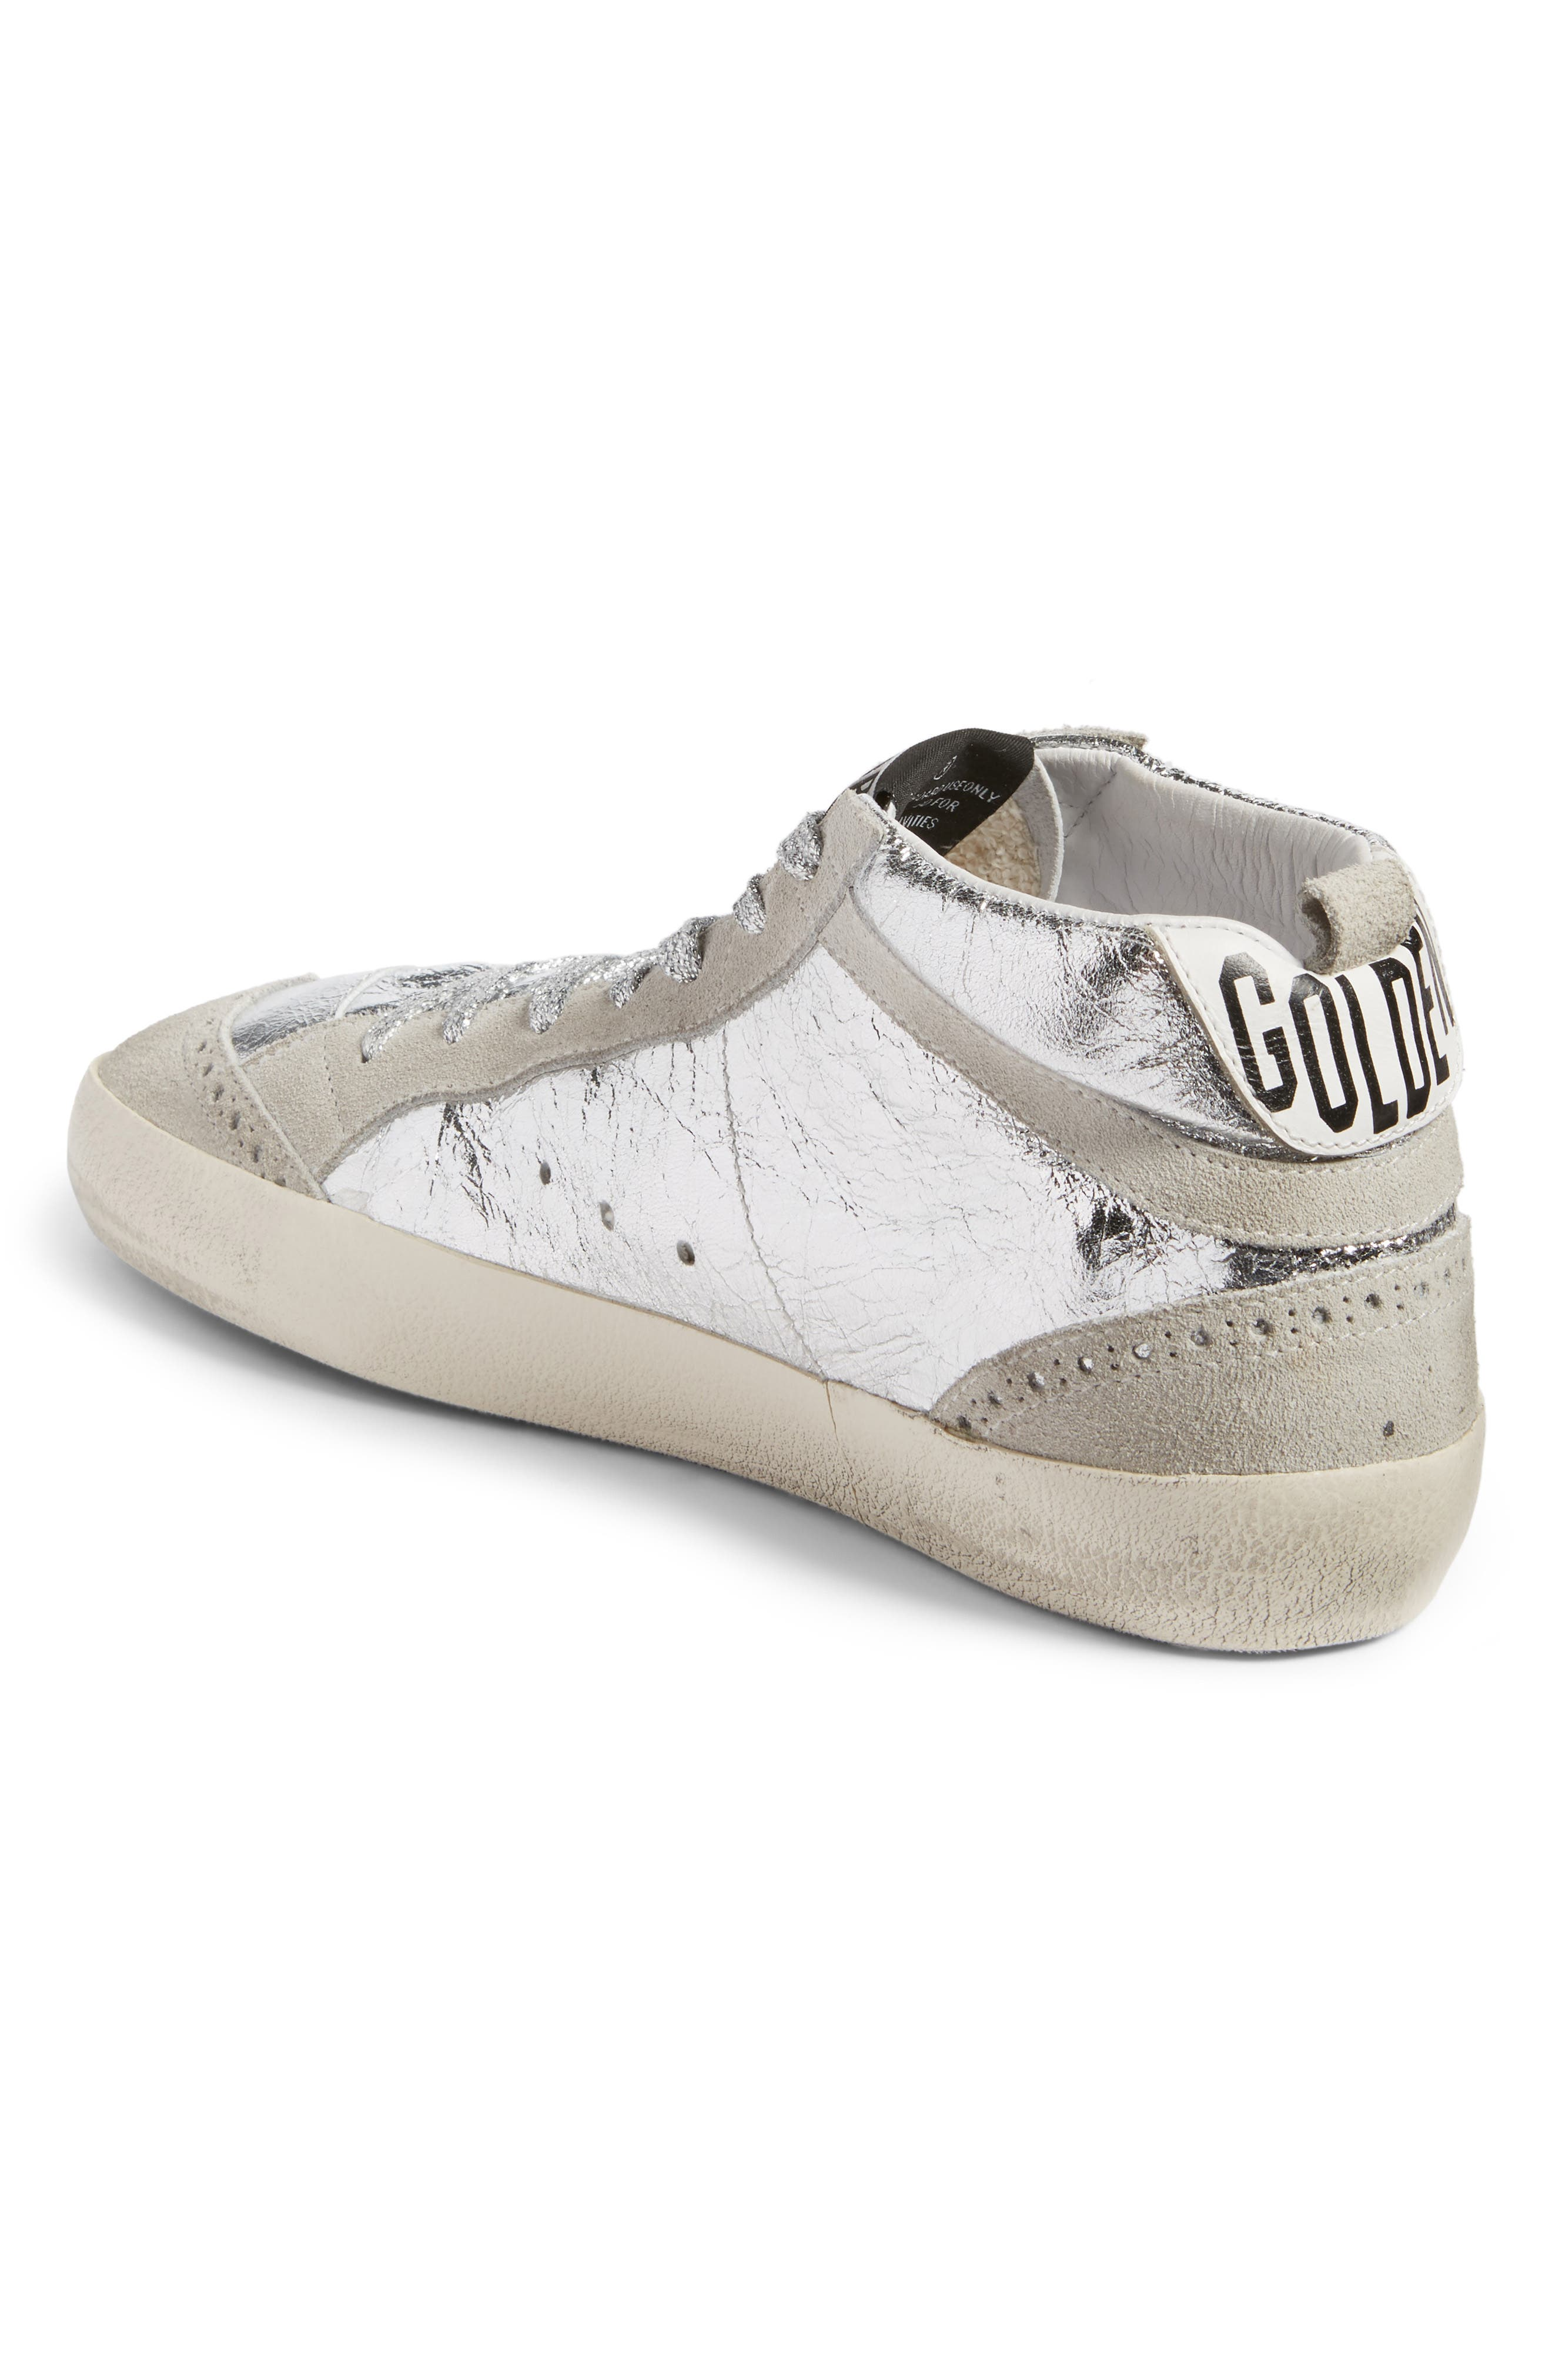 Mid Star Metallic Sneaker,                             Alternate thumbnail 2, color,                             040